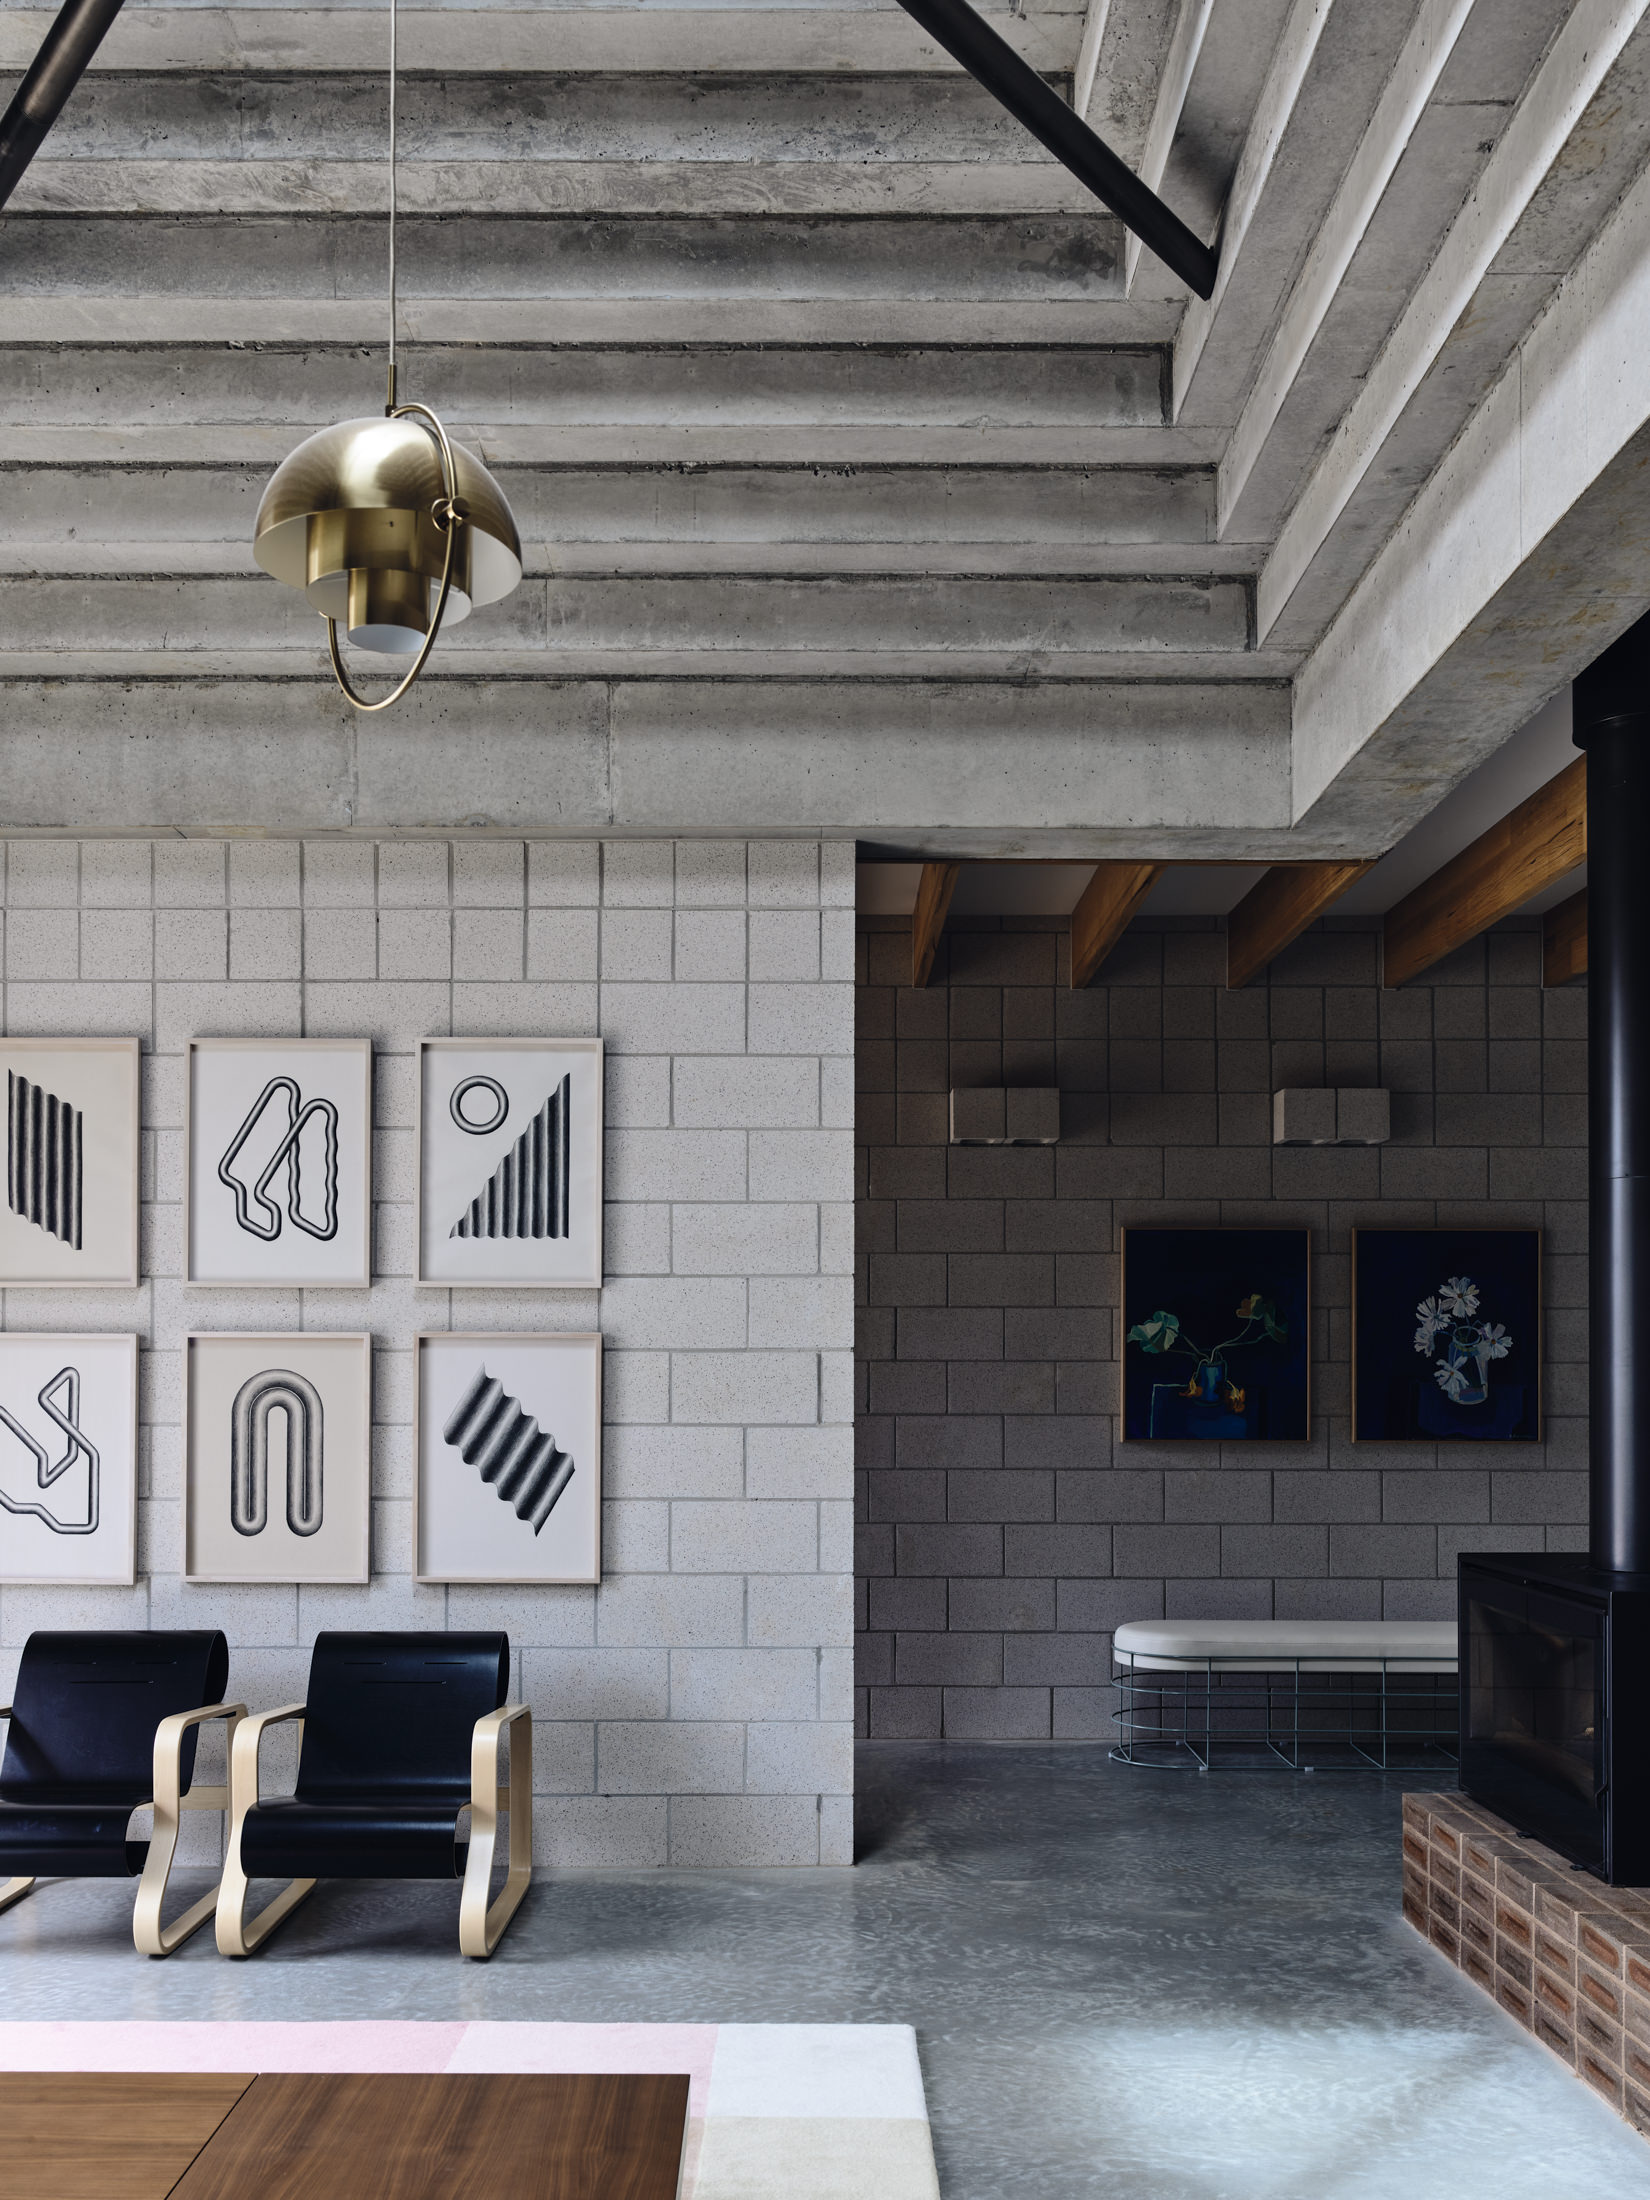 Architects Eat Bellows Beach House Flinders Masonry Architecture Photo Derek Swalwell Yellowtrace 20